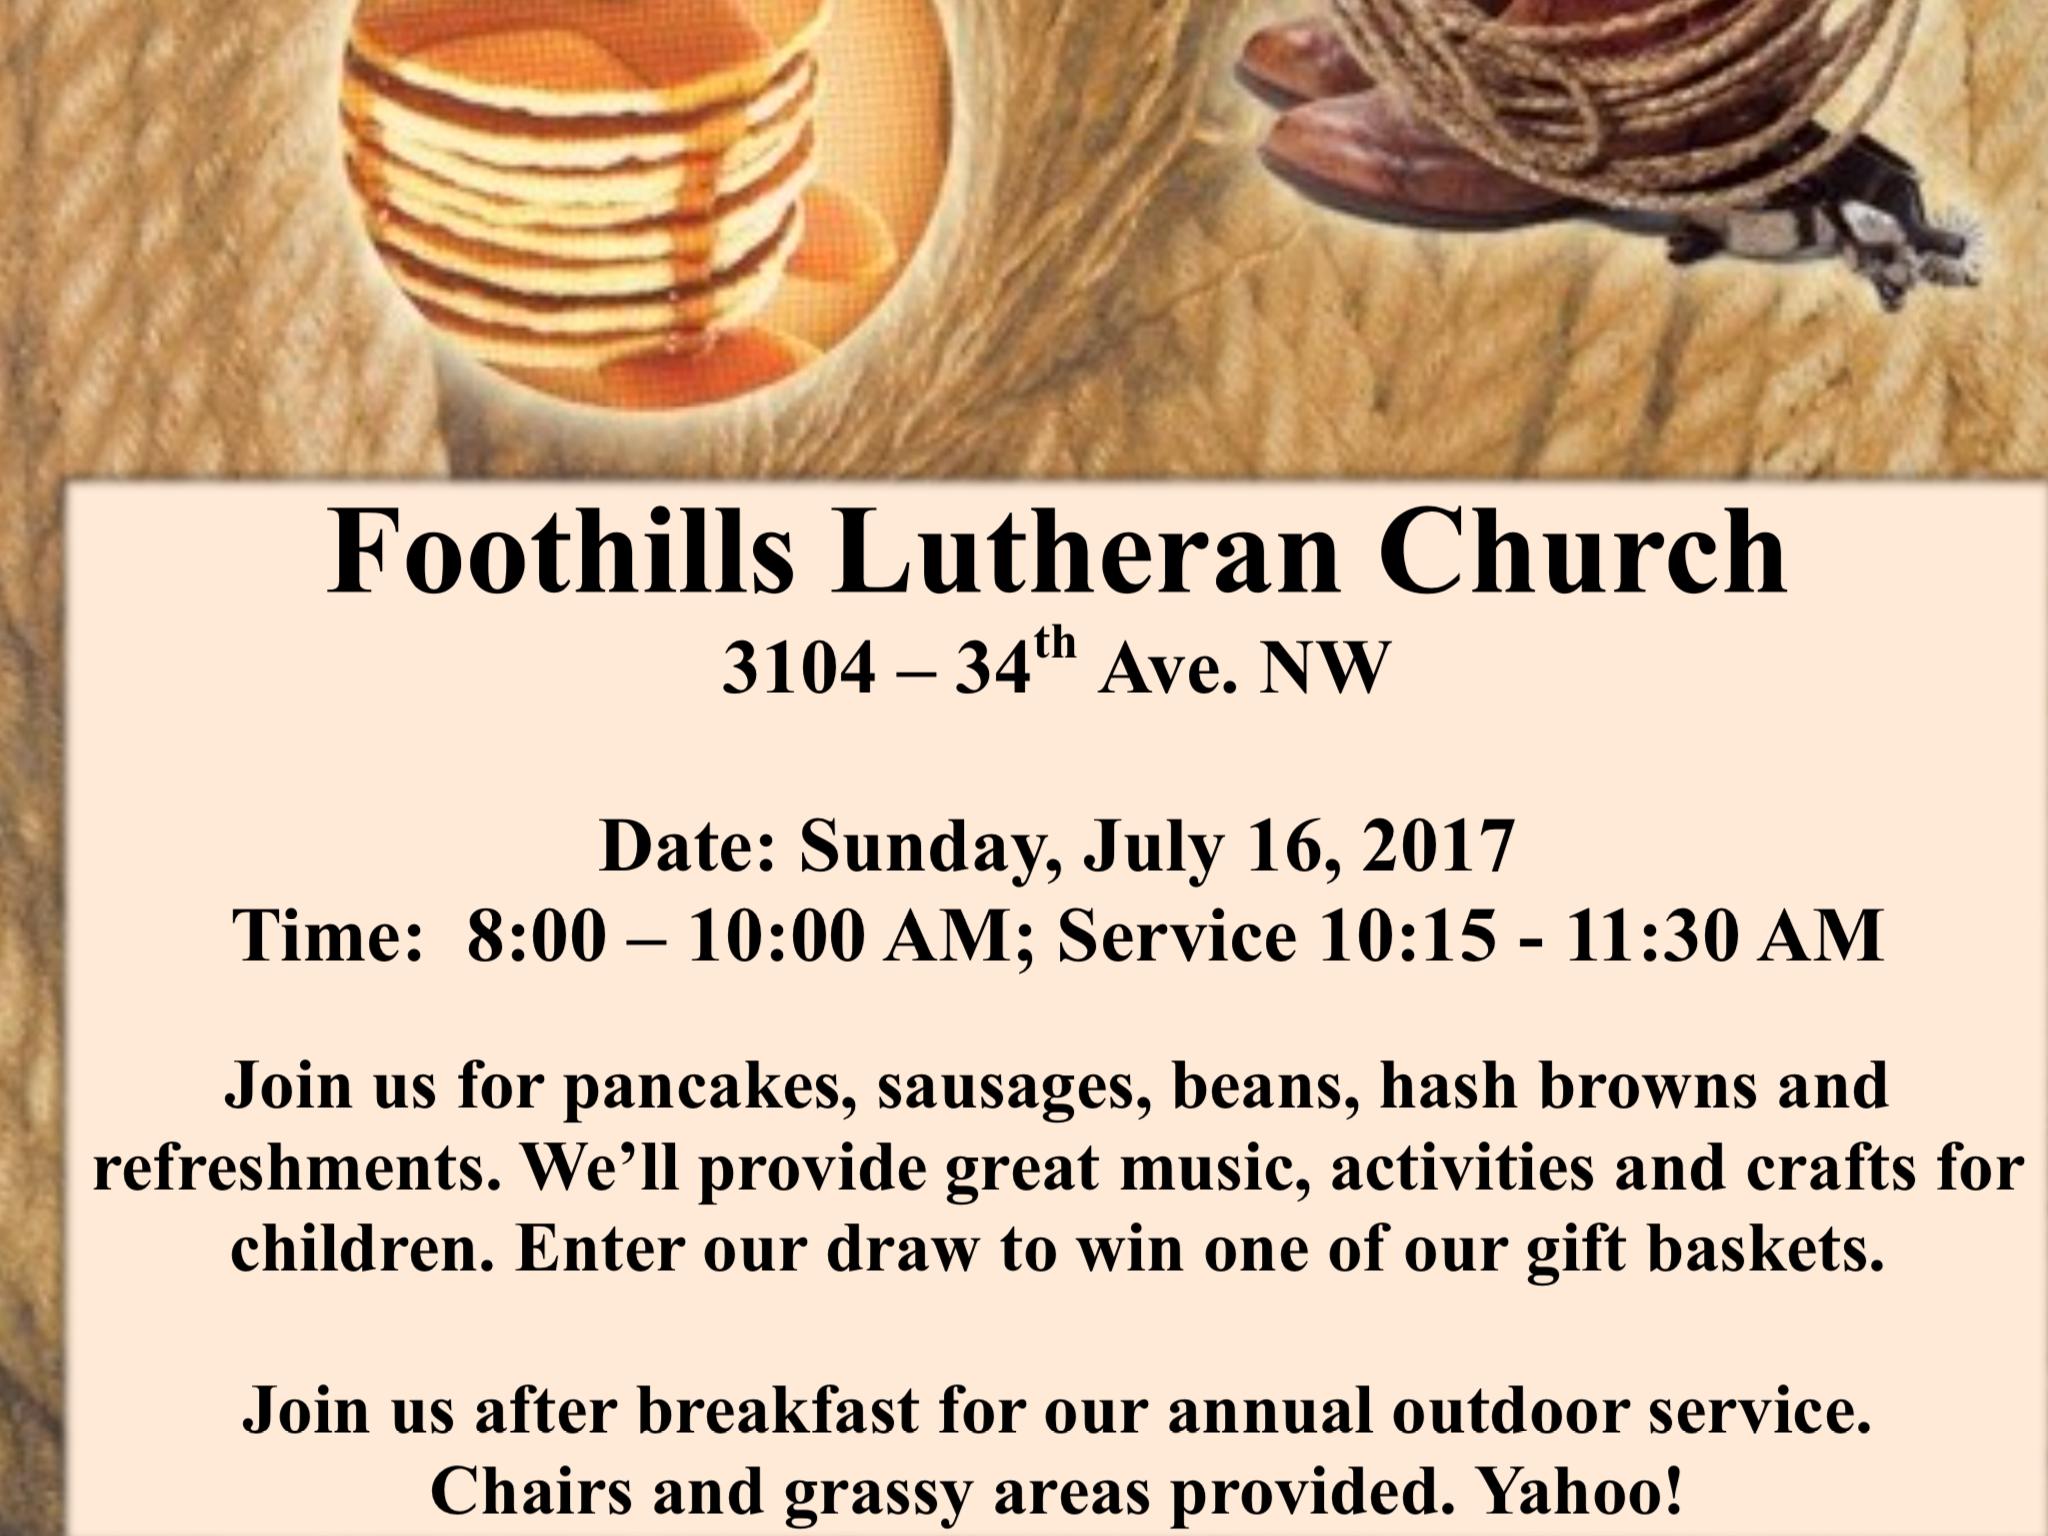 Foothills Lutheran Annual Stampede Breakfast 2017